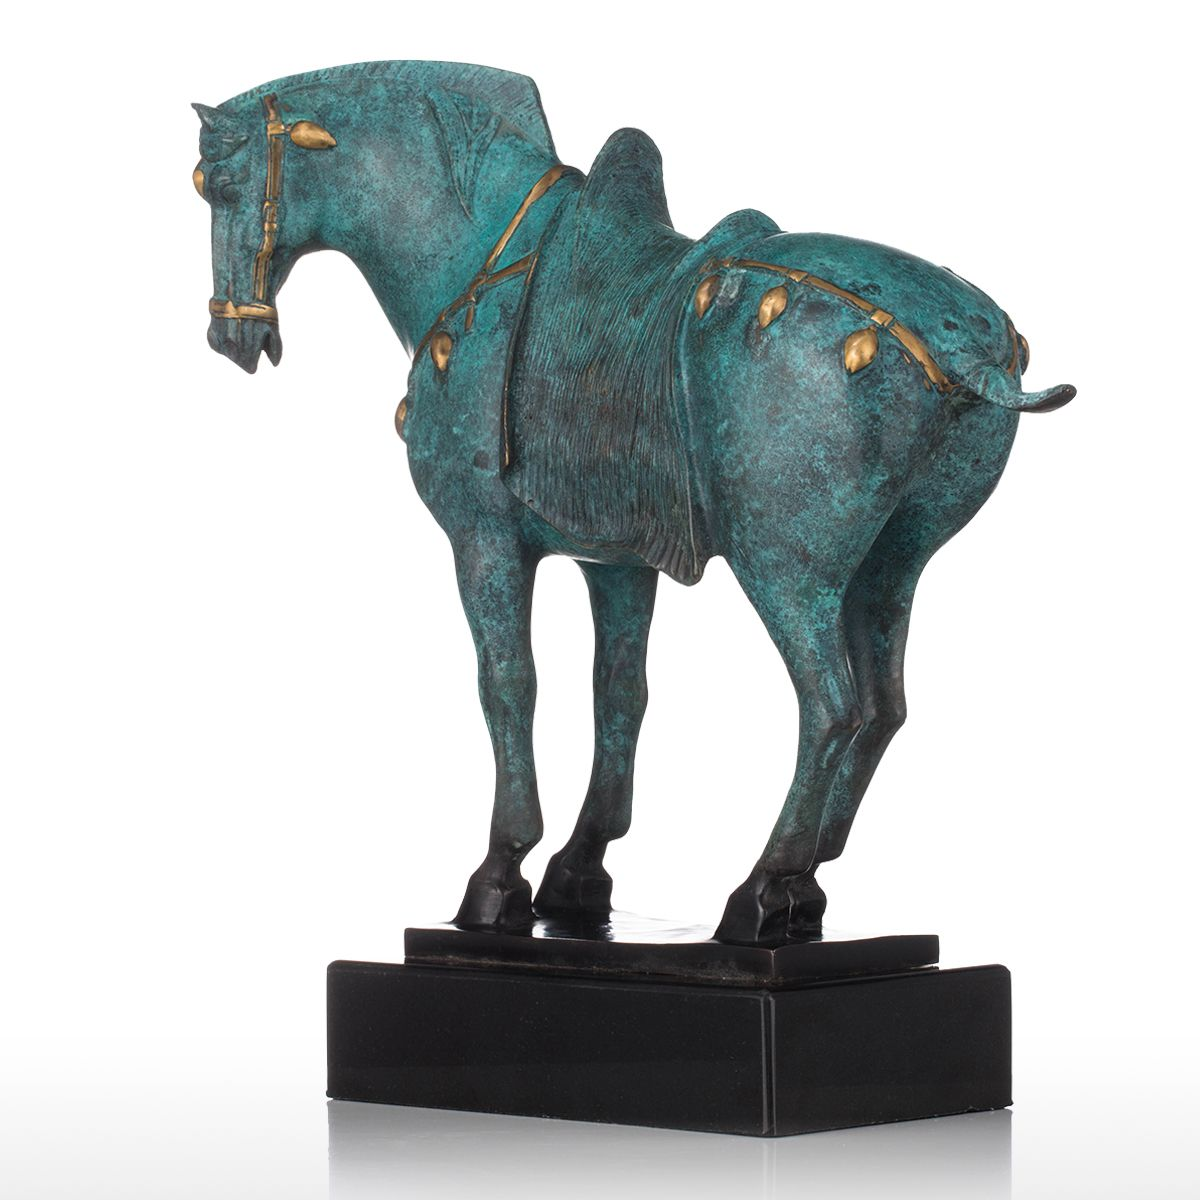 Characteristics of bronze